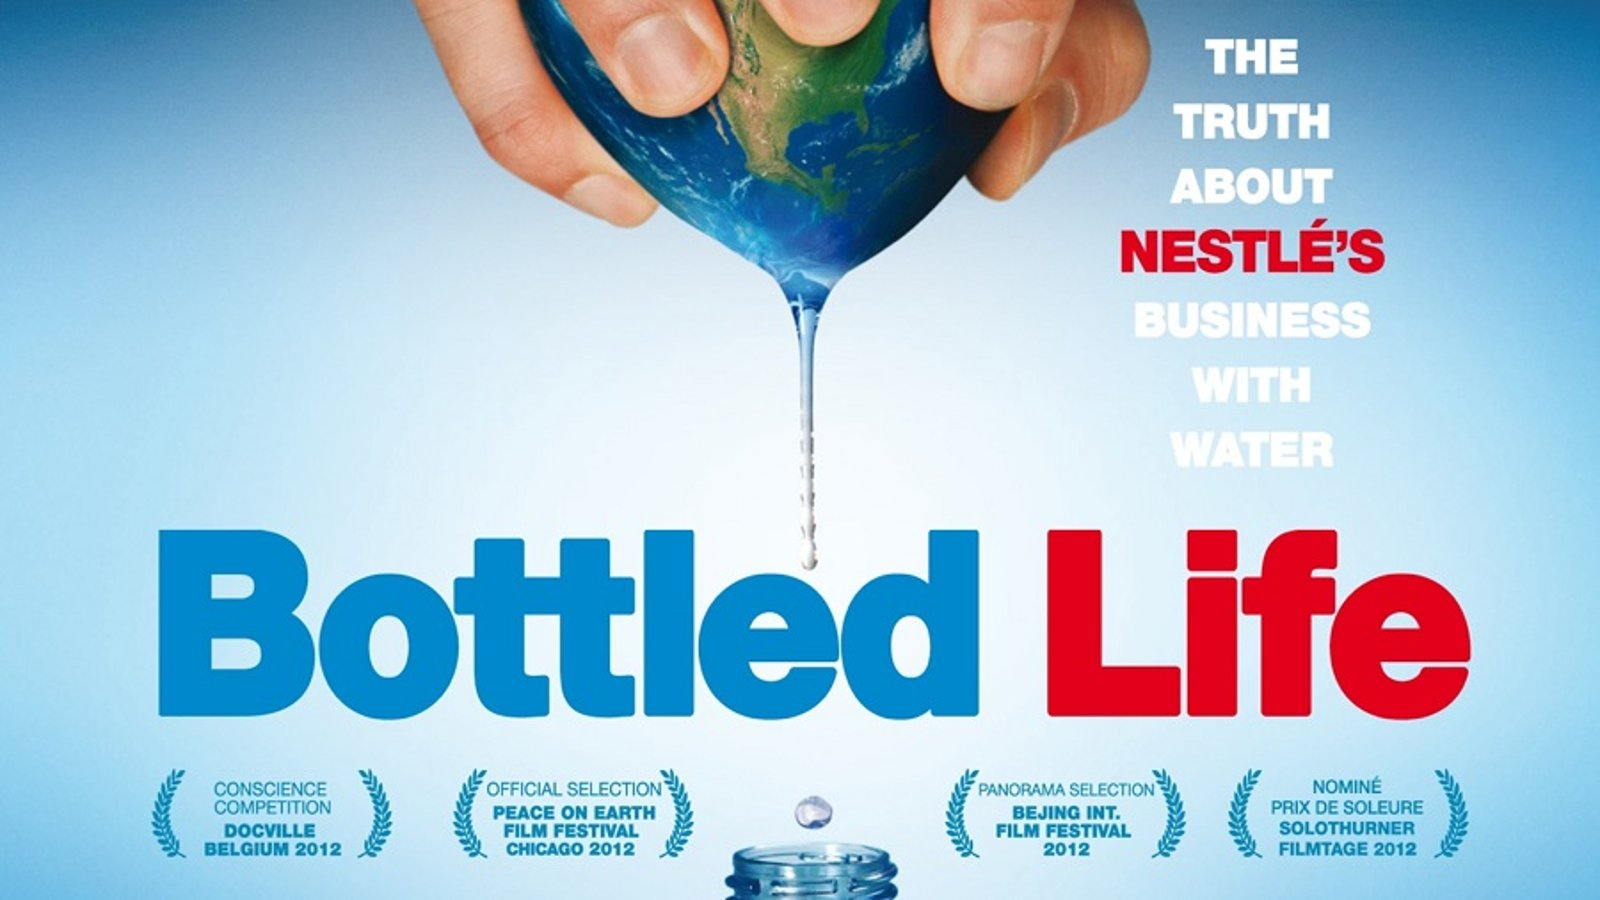 Bottled Life - The Global Business of Bottled Water